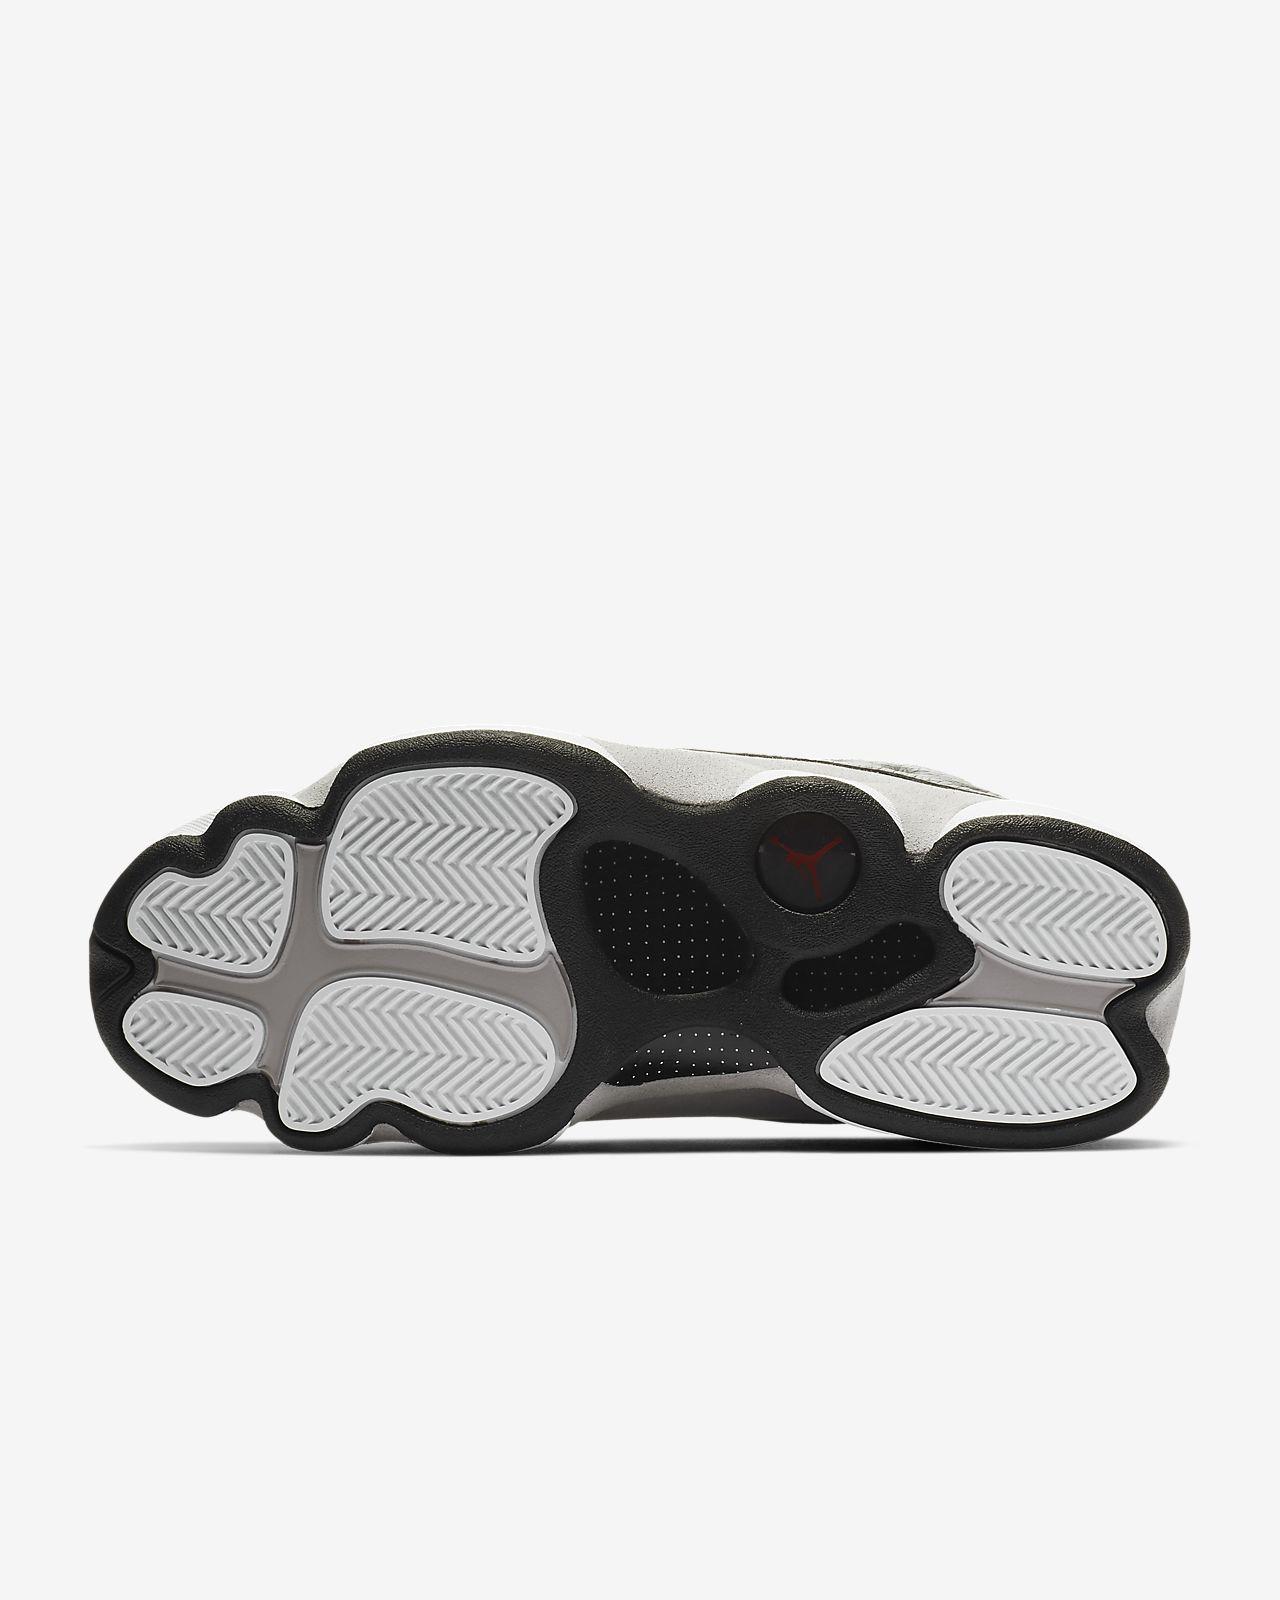 size 40 4b0ea 1aa96 ... Air Jordan 13 Retro Men s Shoe